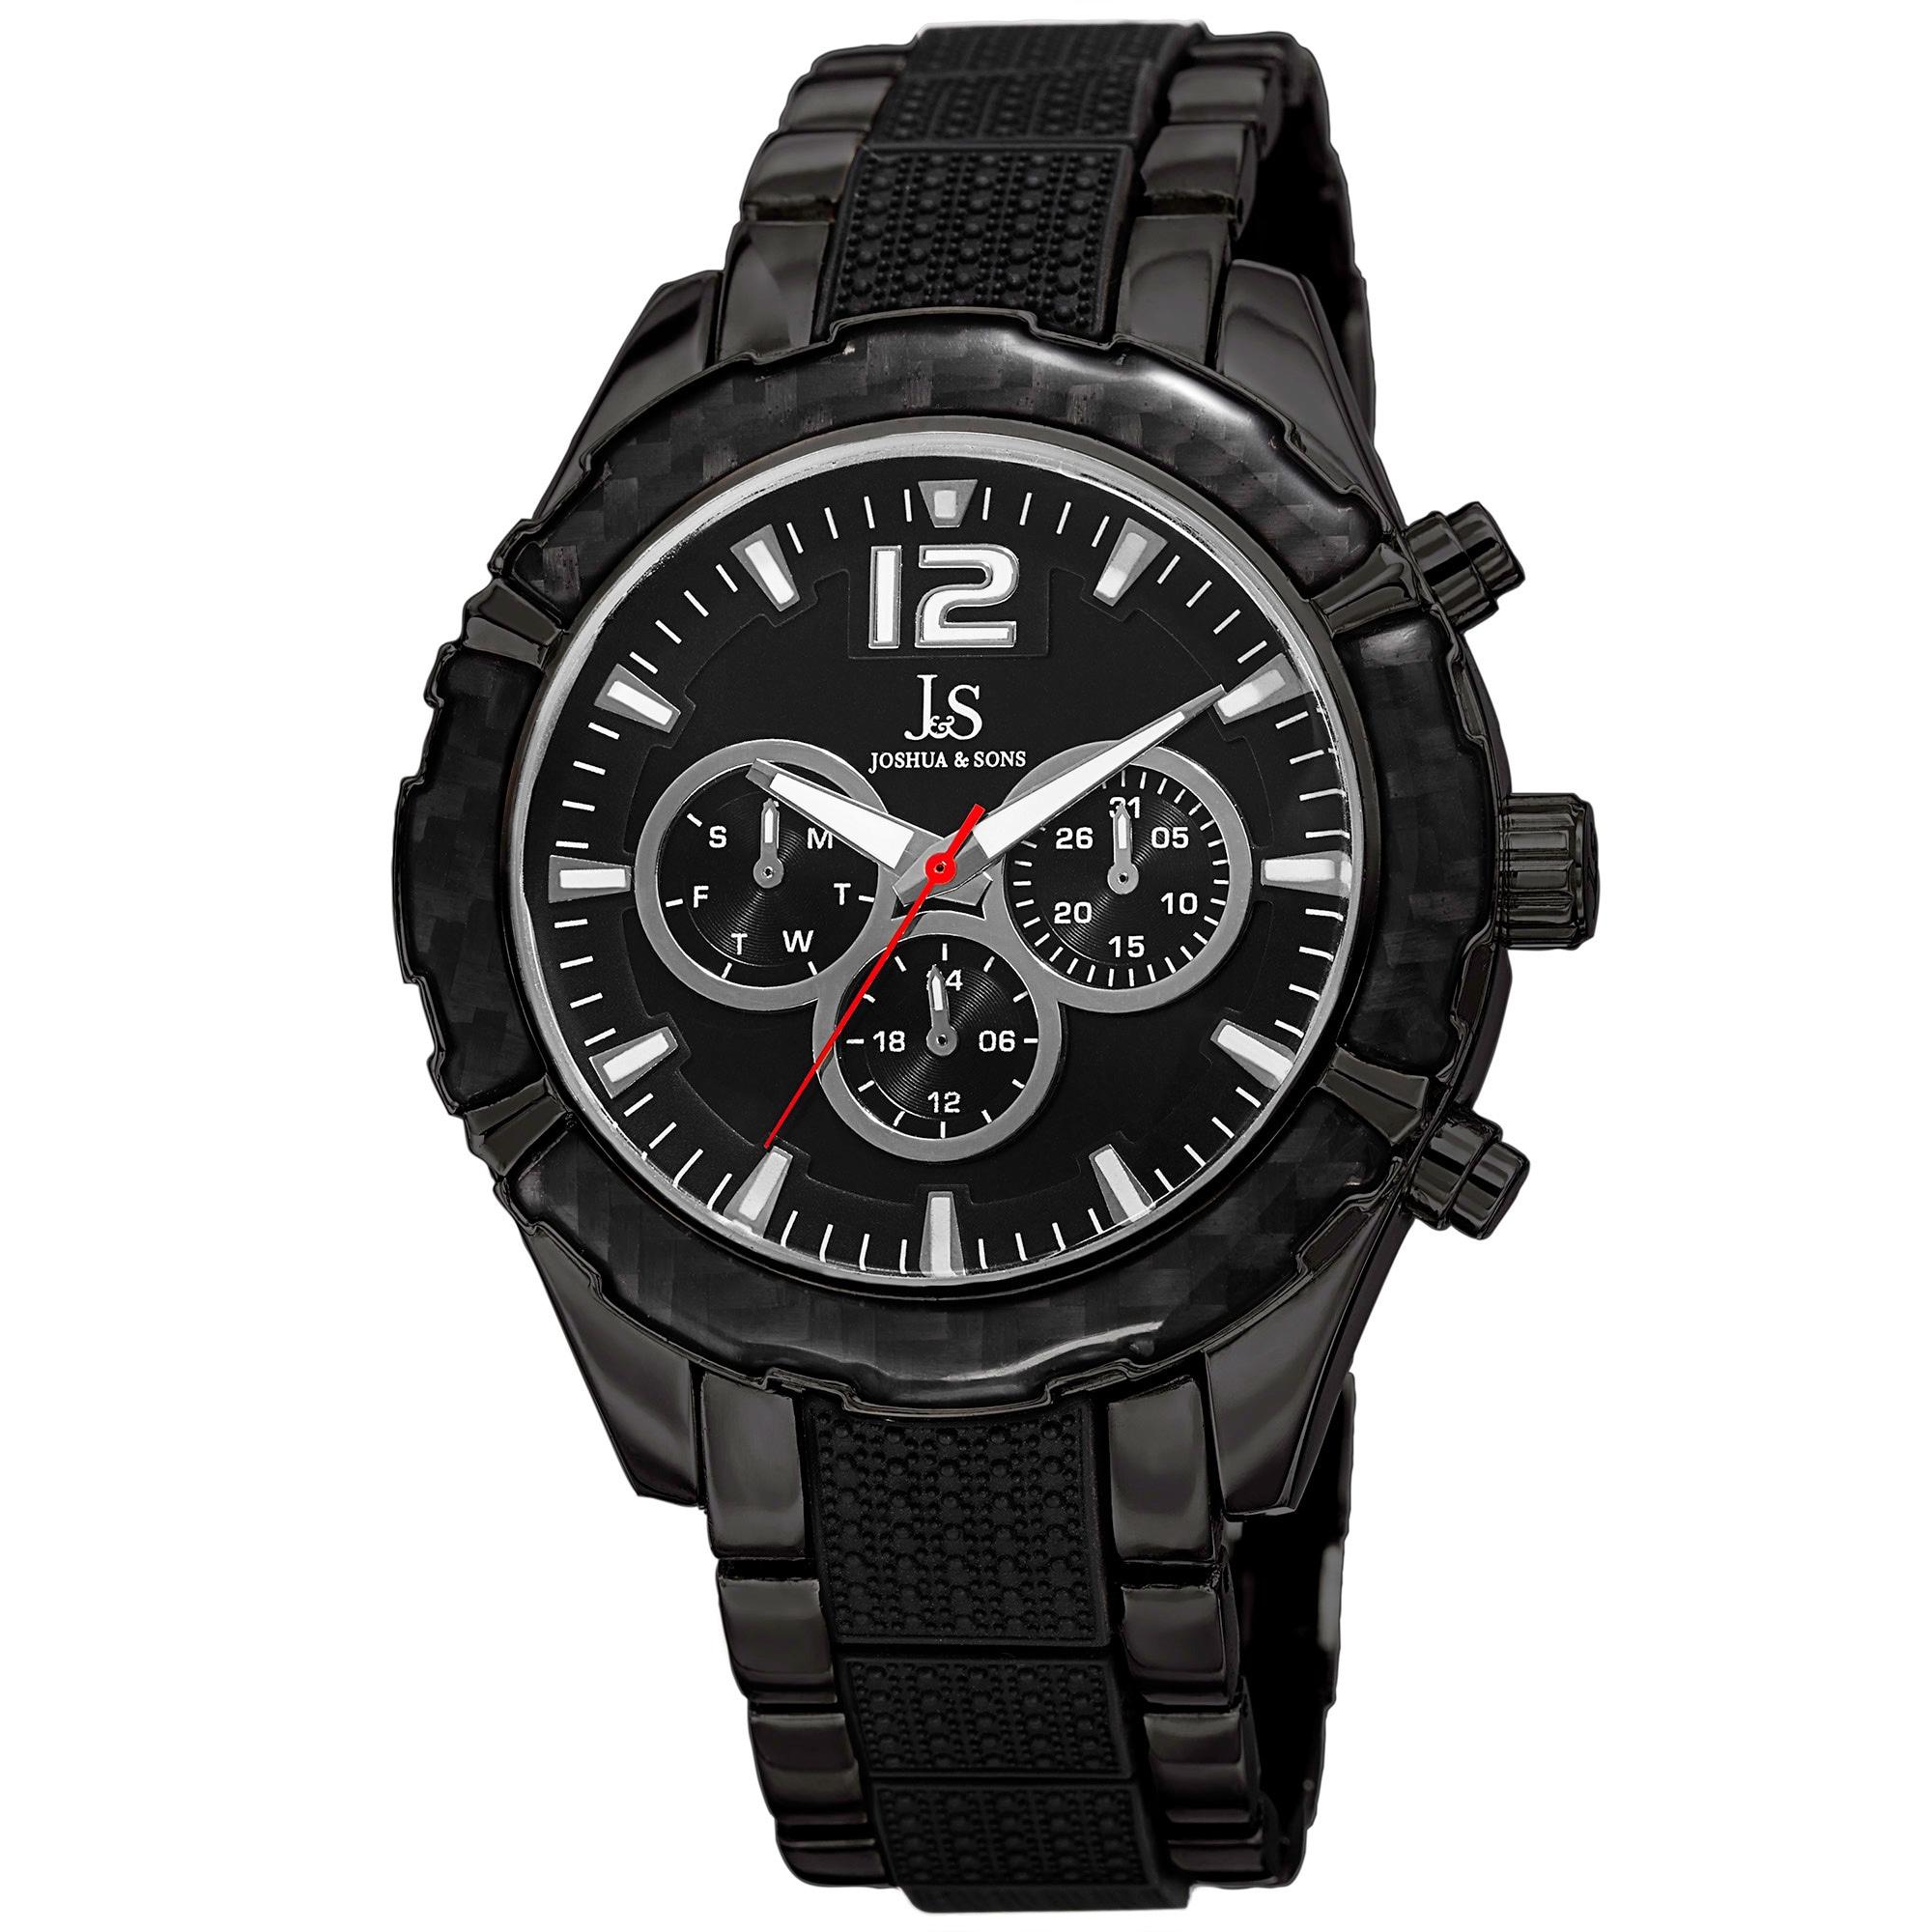 6e5d2763fbb Shop Joshua   Sons Men s Swiss Quartz Multifunction Bracelet Watch - On  Sale - Free Shipping Today - Overstock - 10534070